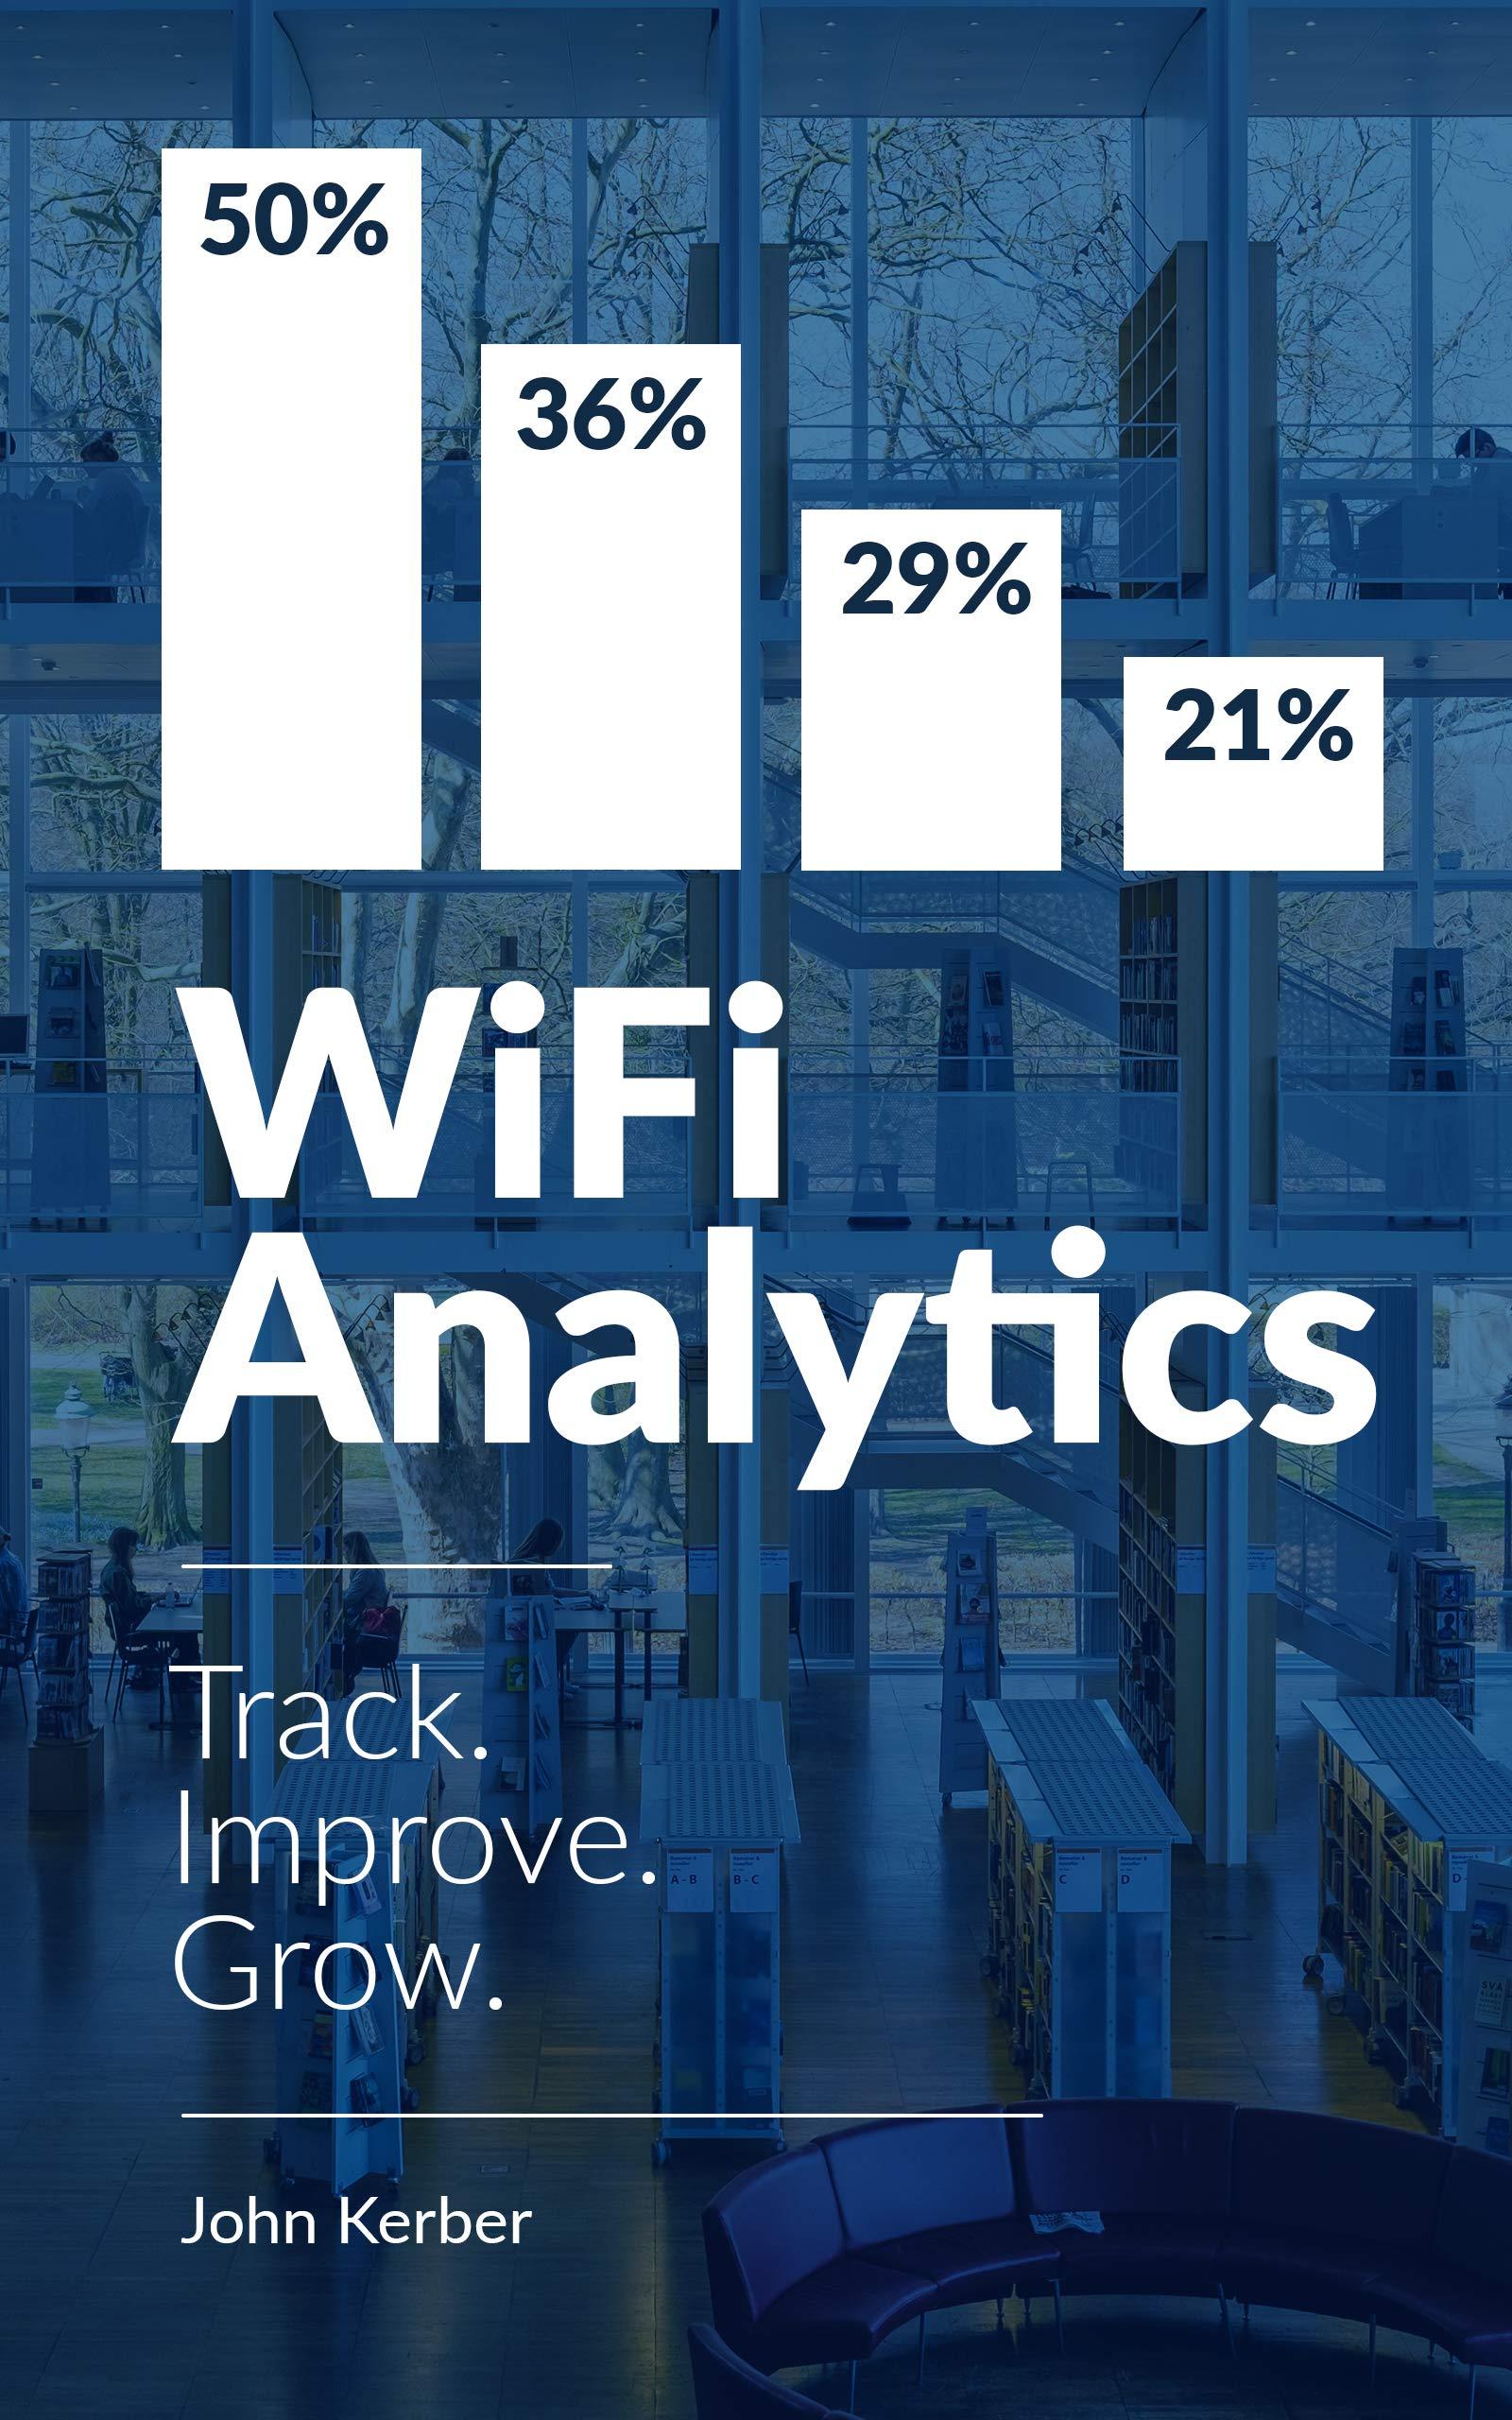 WiFi Analytics: Track. Improve. Grow.